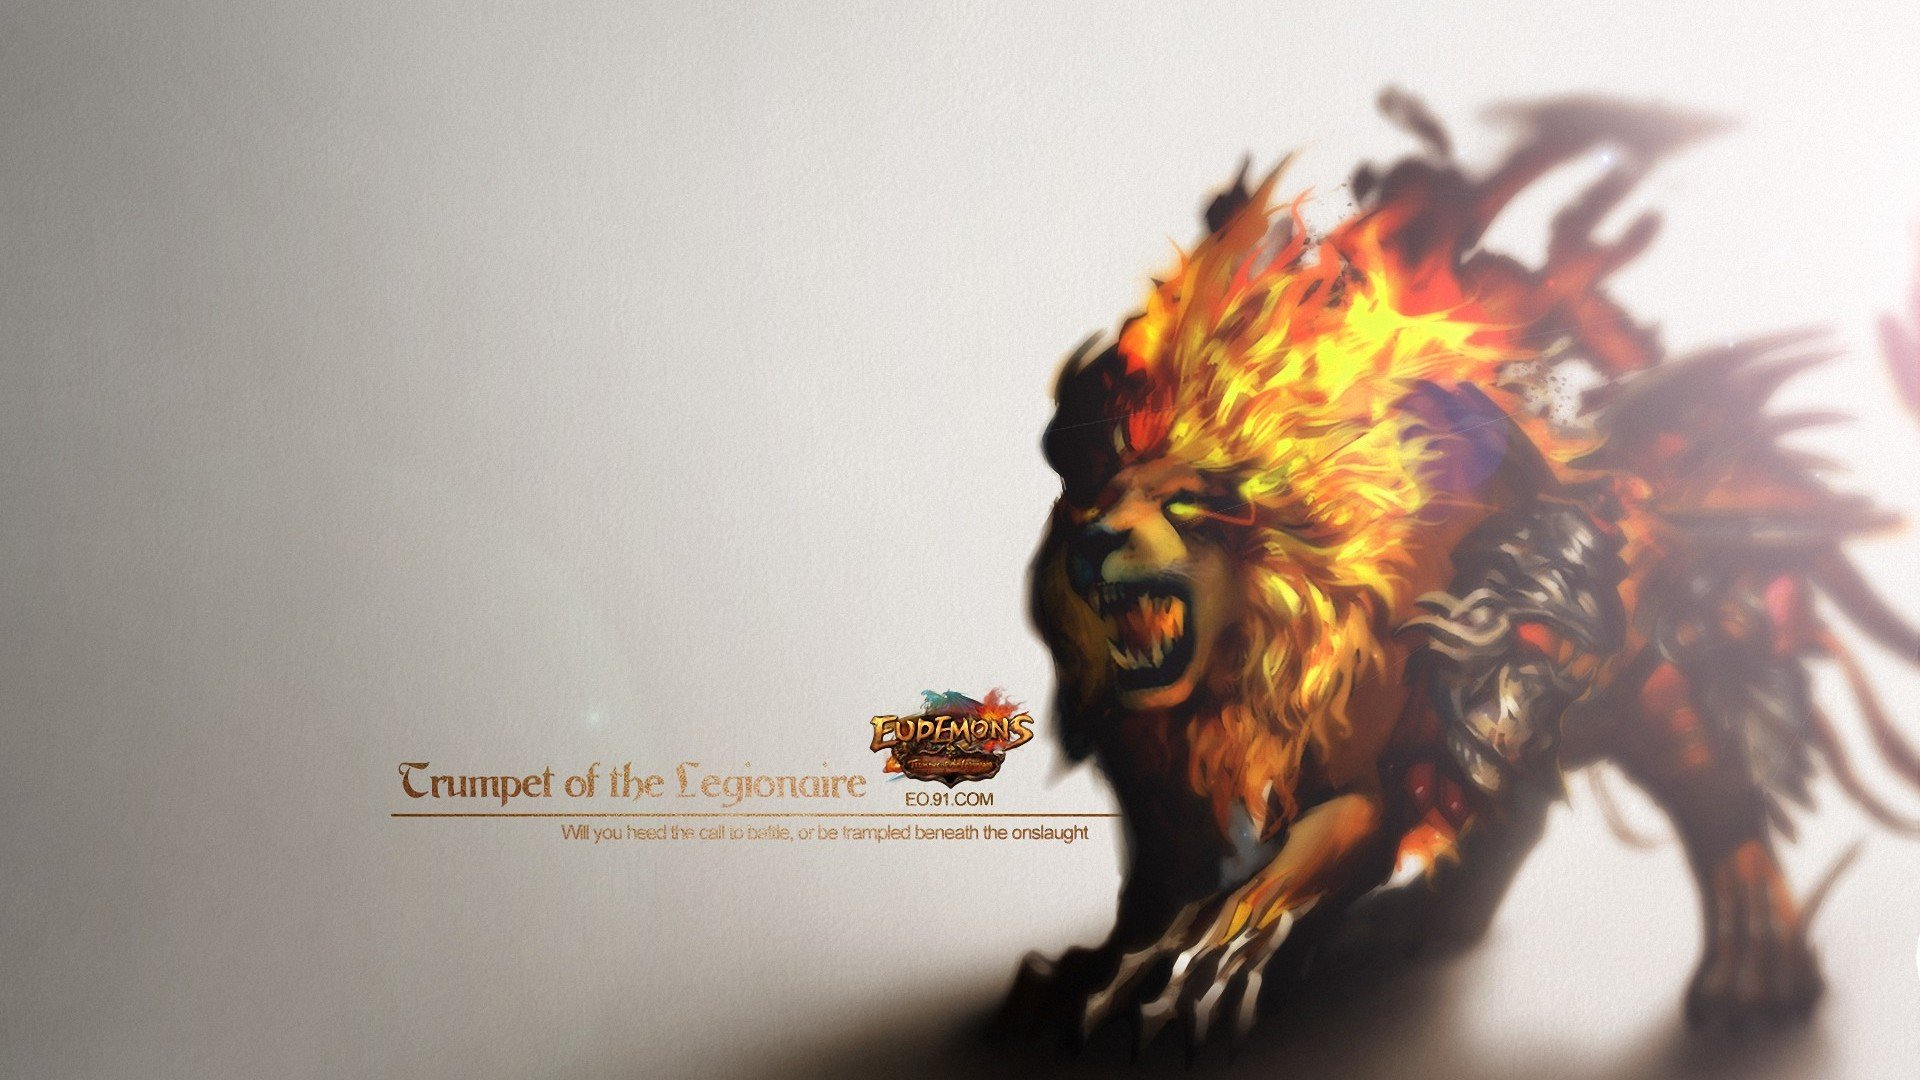 Girl Wallpaper Download Hd Eudemons Online Mmo Rpg Fantasy Lion Wallpaper 1920x1080